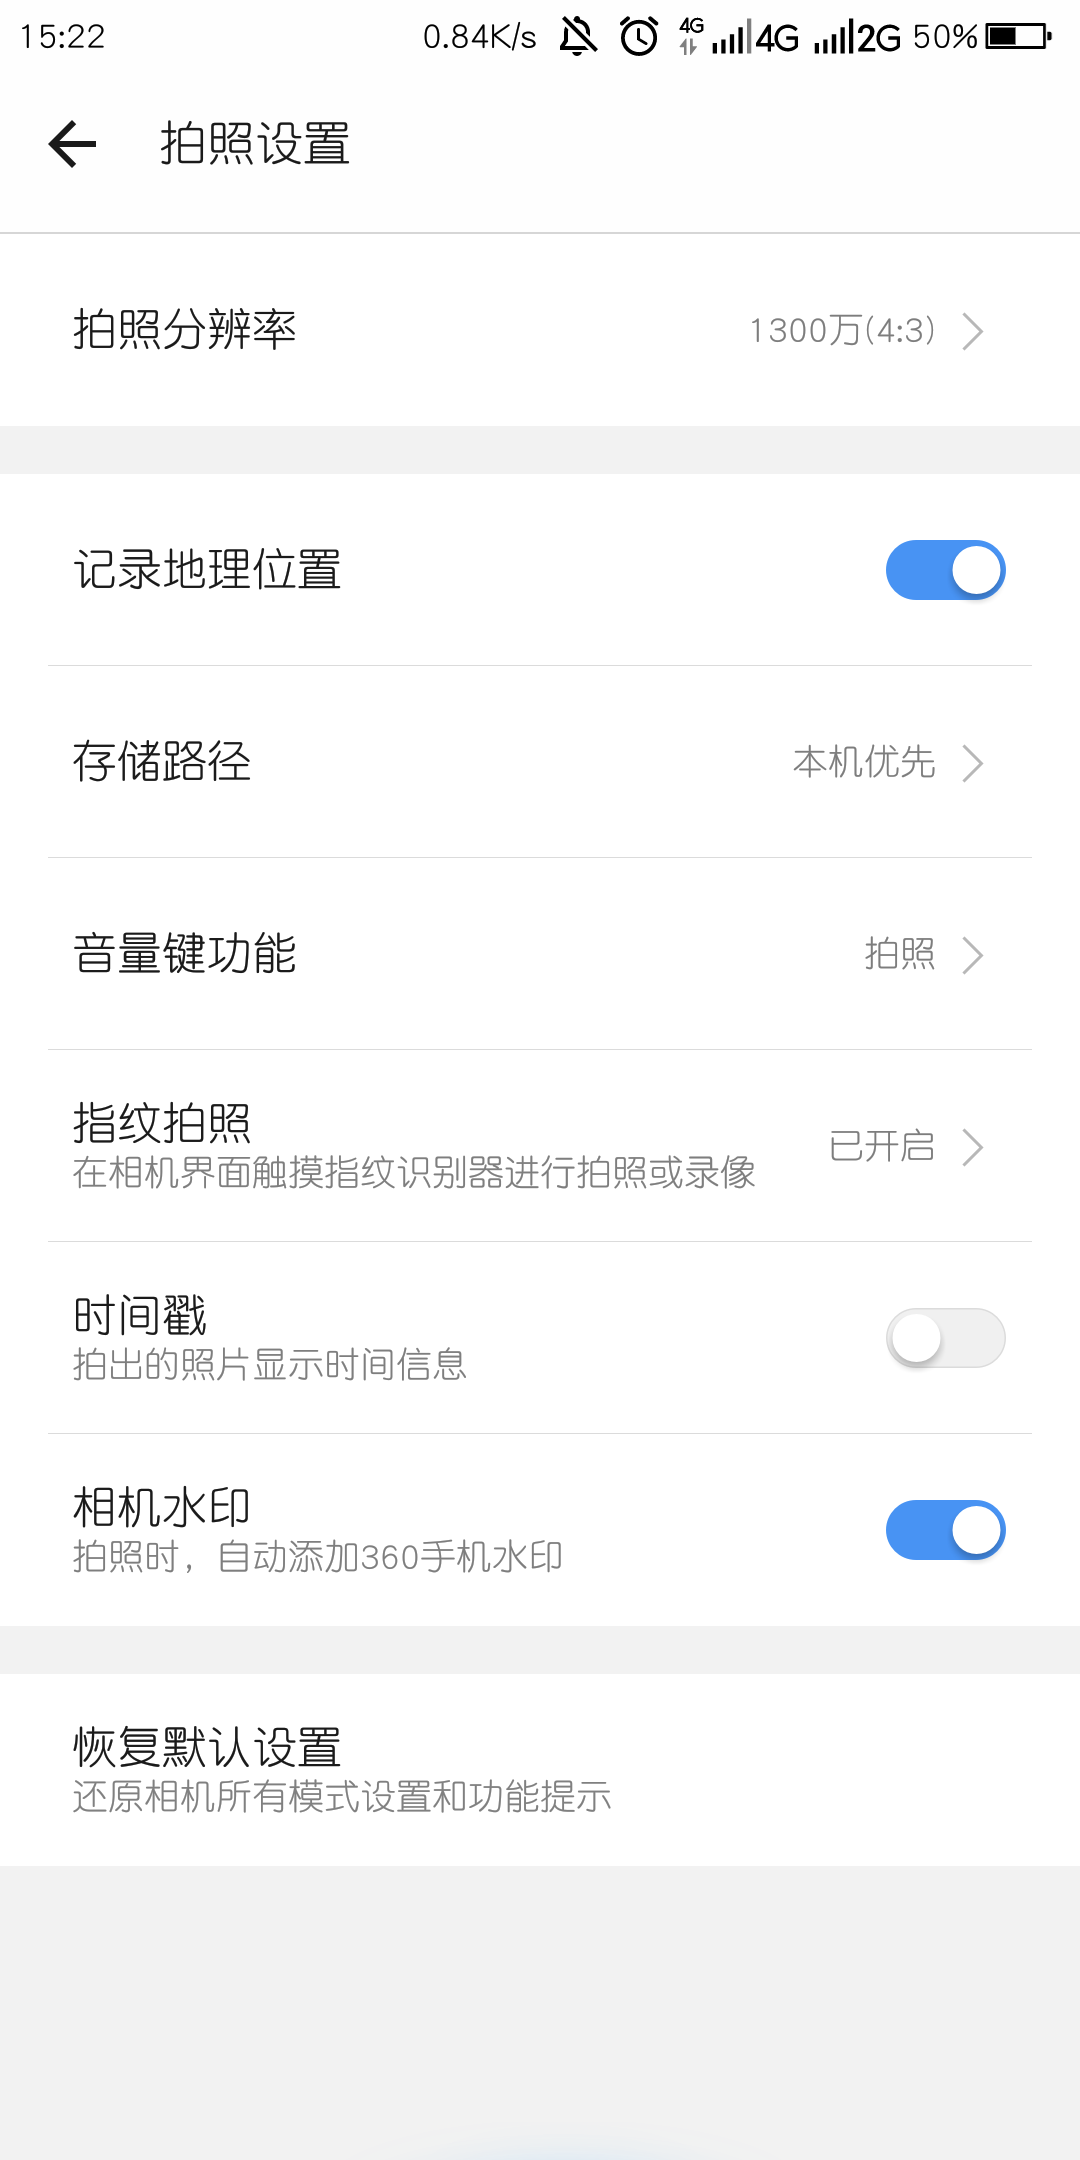 Screenshot_2018-09-13-15-22-32.png